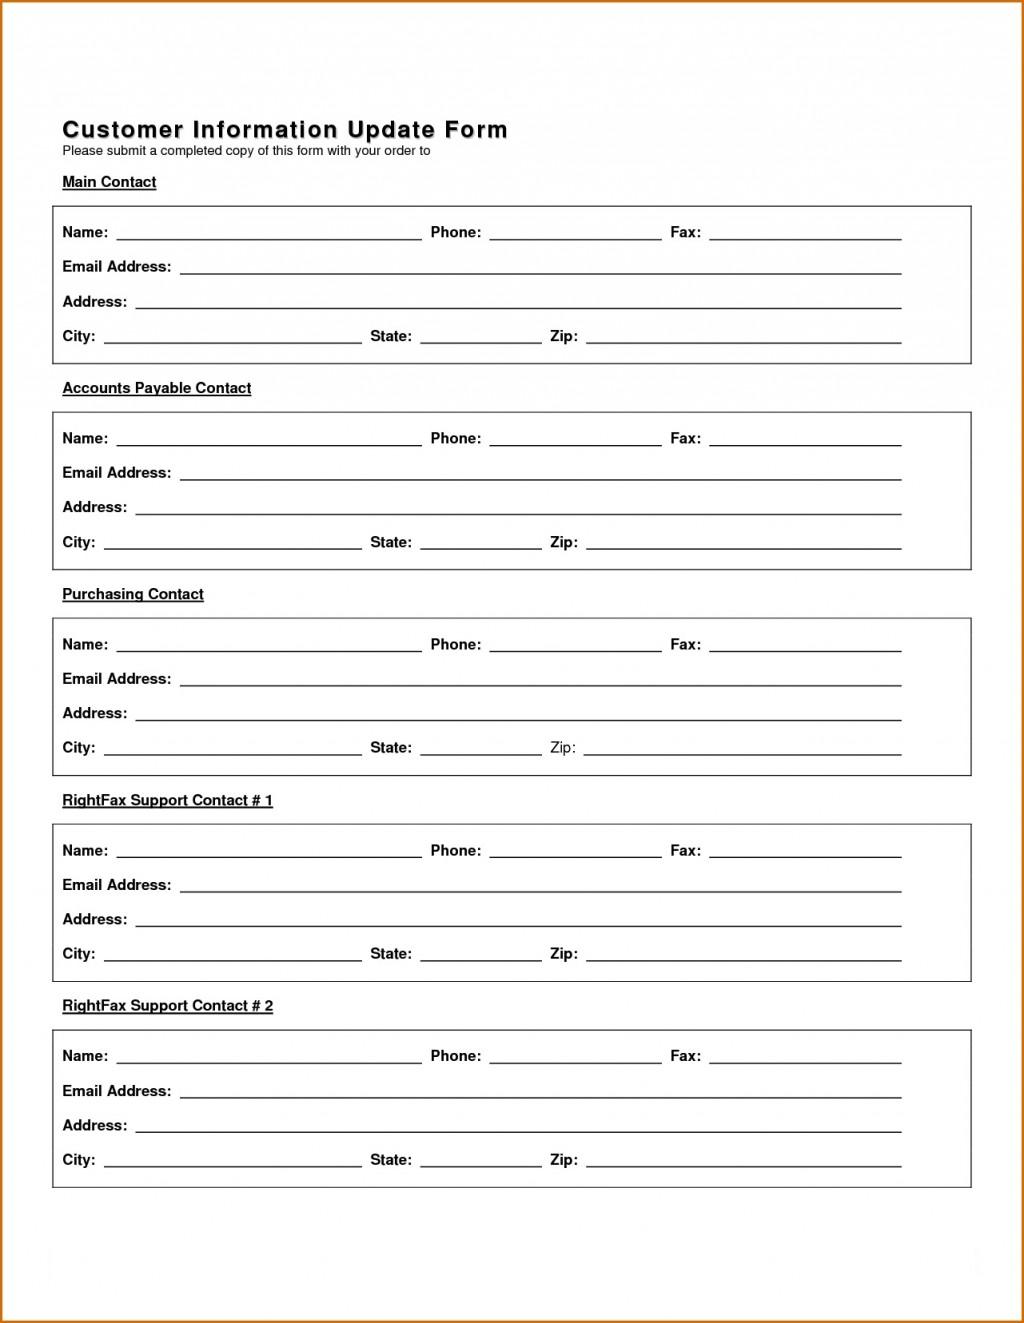 New Customer Information Update Form  Template Uk Account SetupLarge